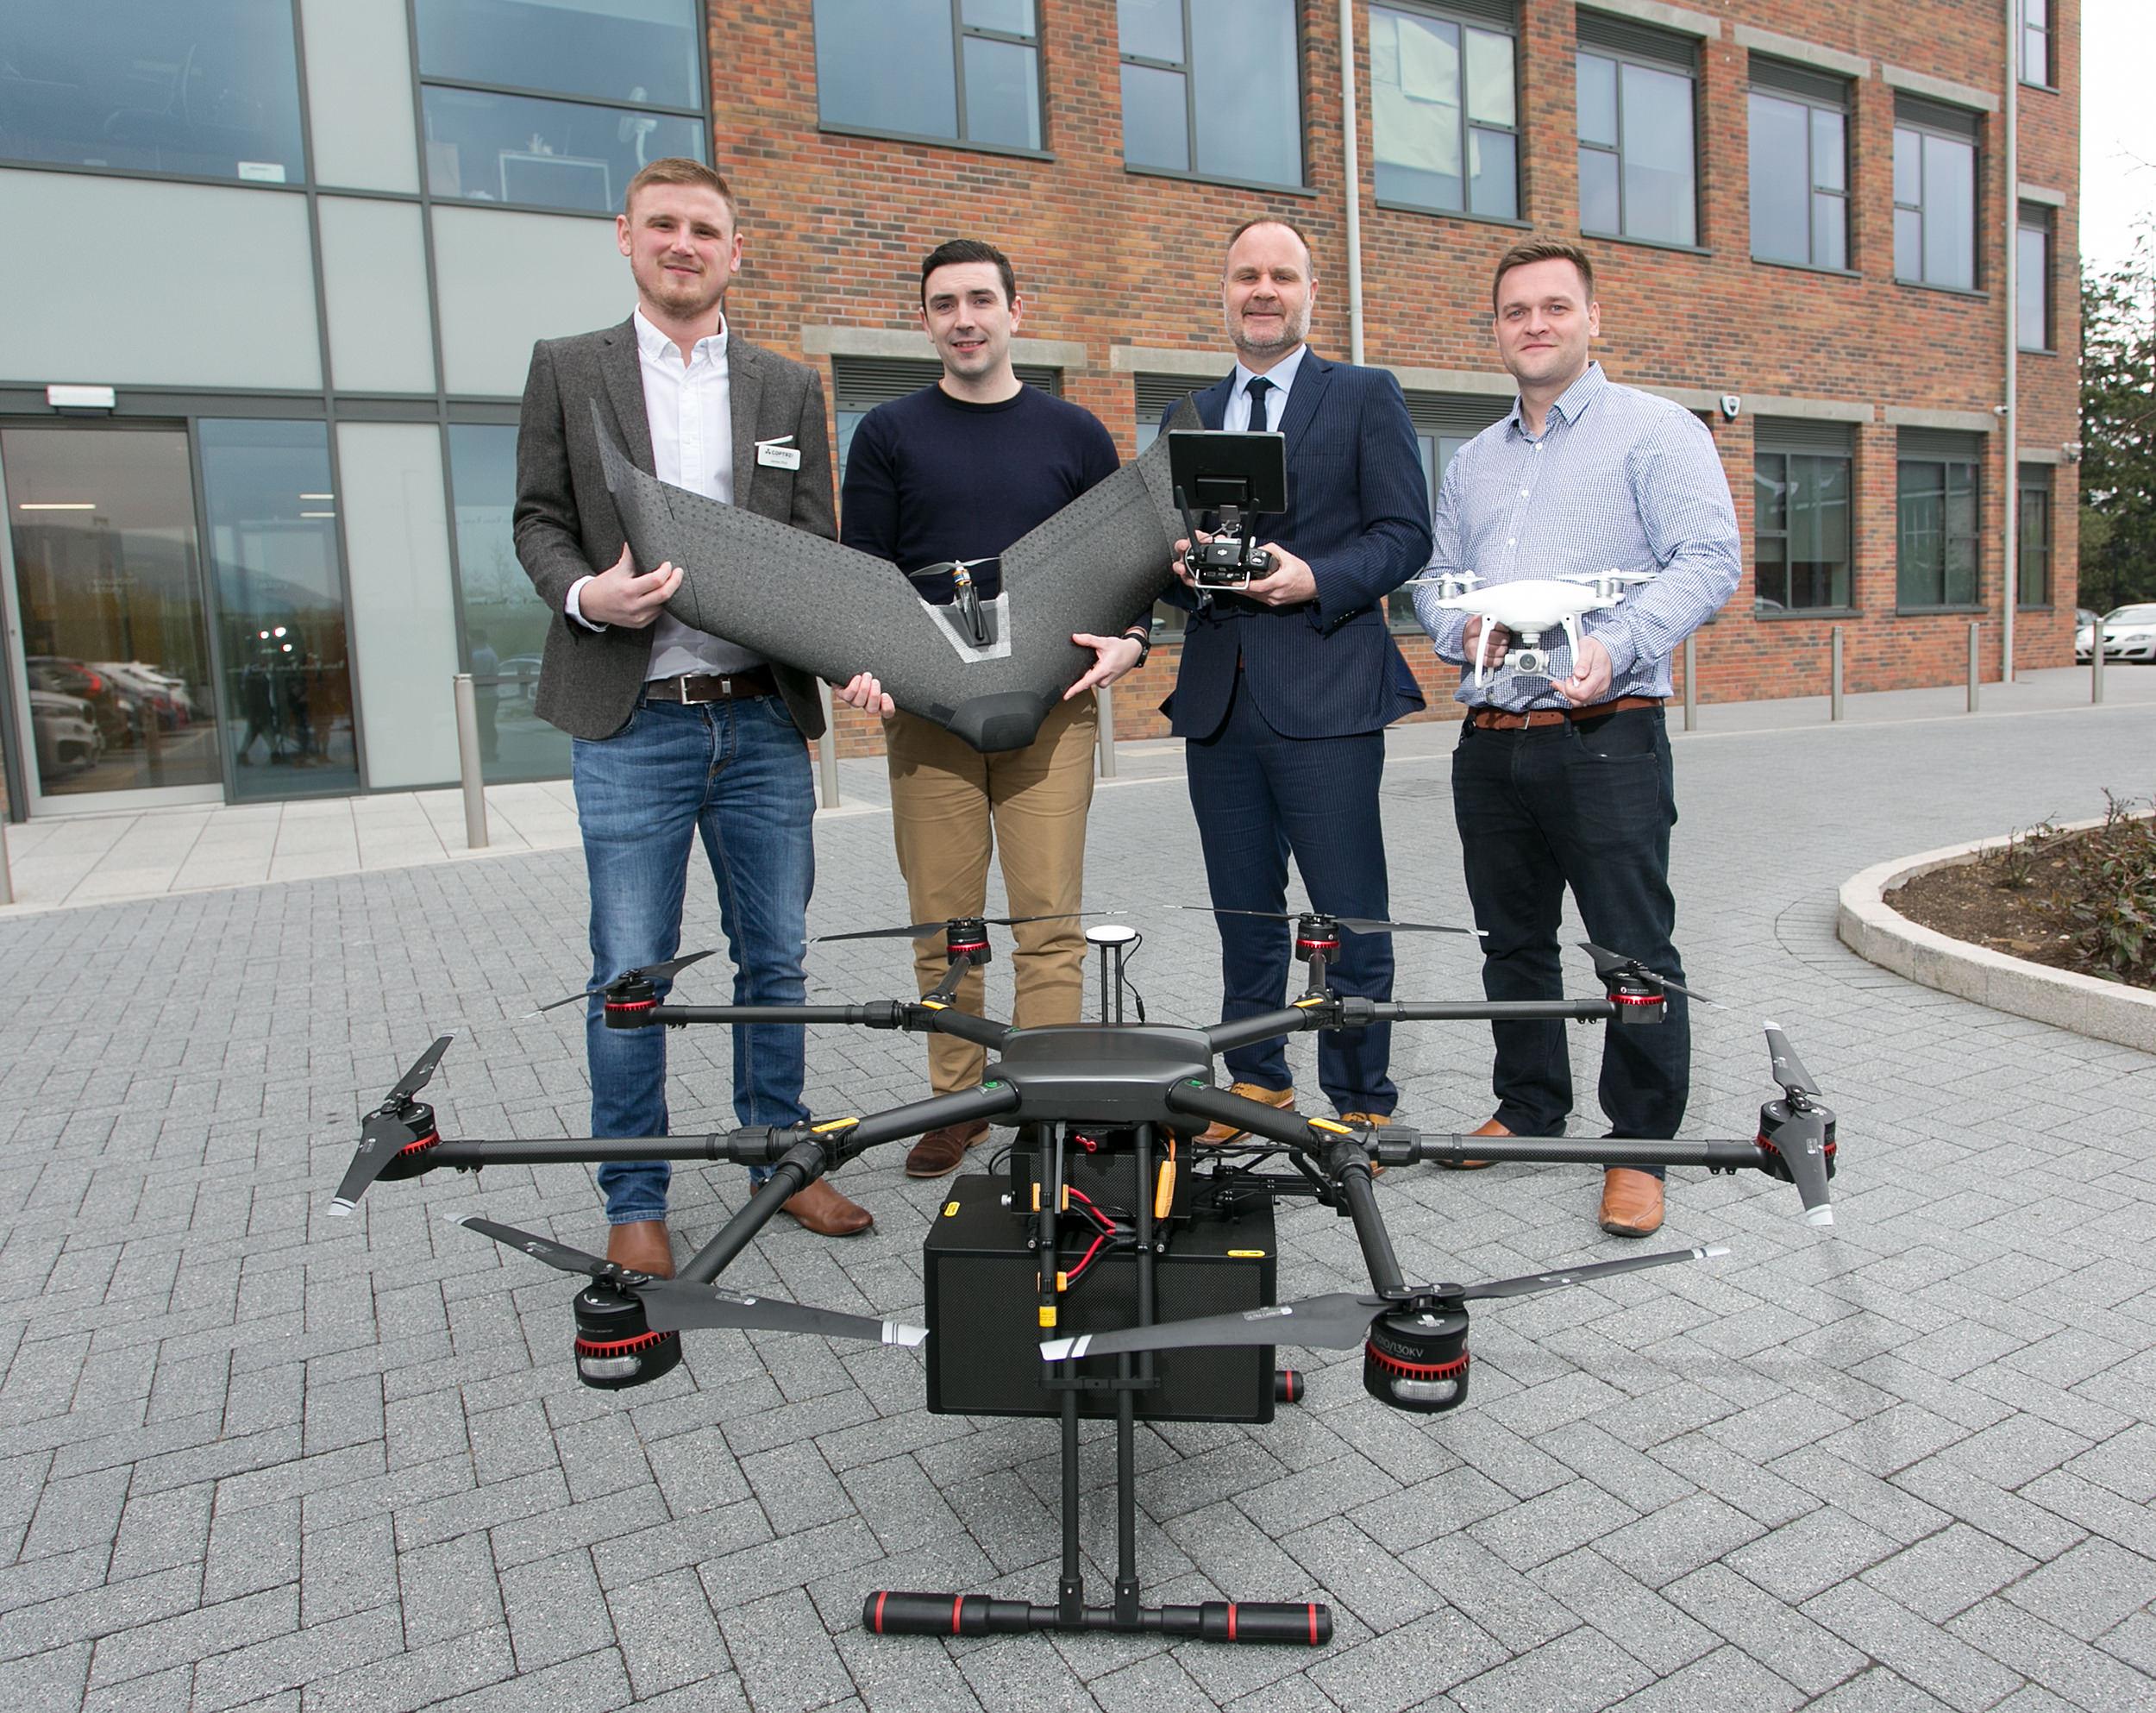 Innovation Factory hosts major drone event